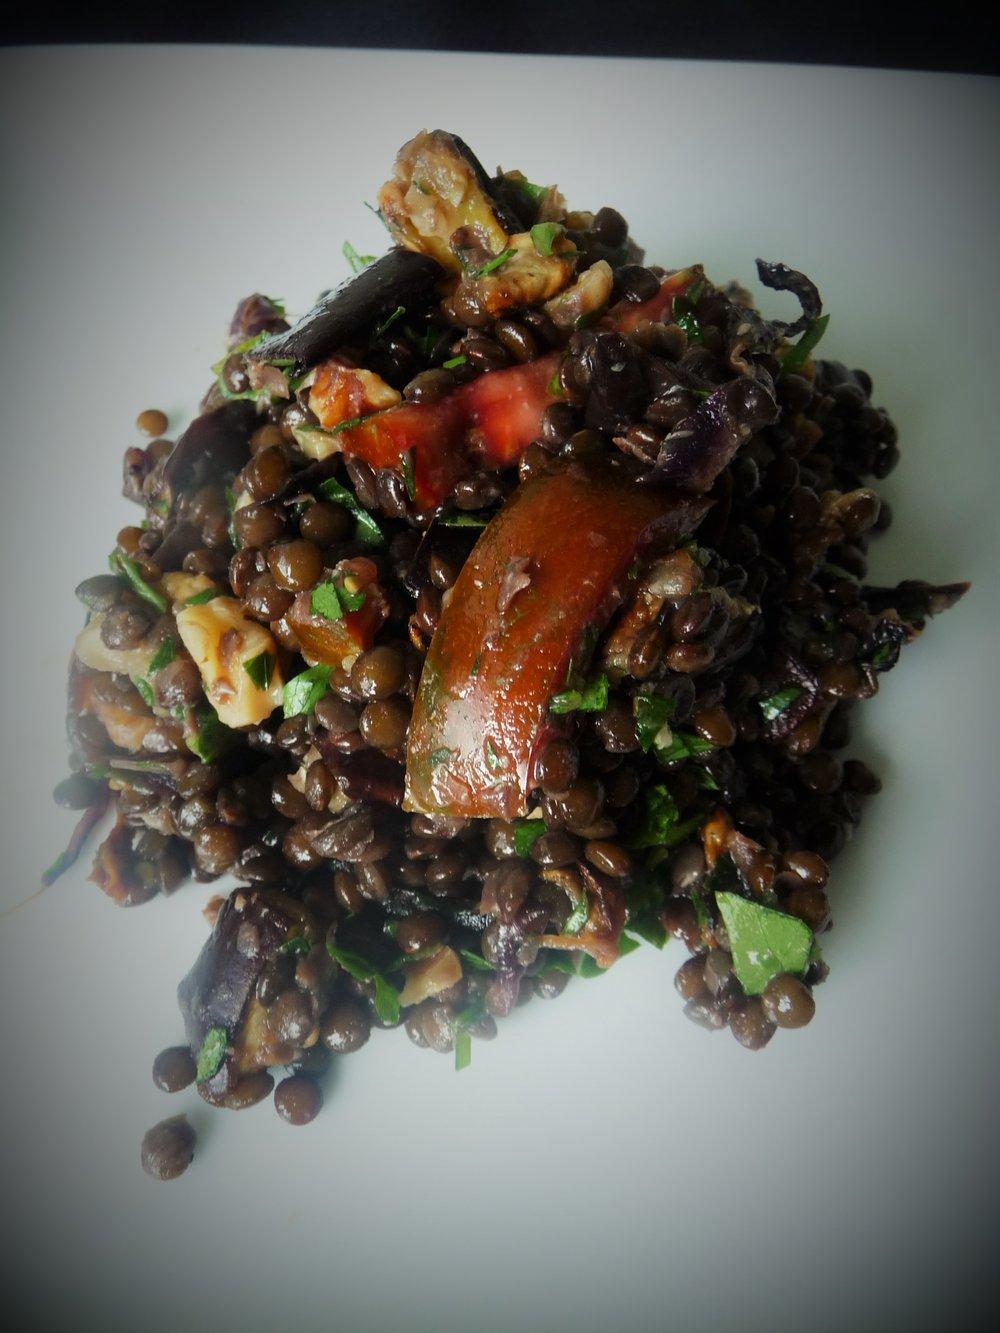 Black Lentil Eggplant Walnut Georgian Salad - Healthy, Gluten-Free, Grain-Free, Oil-Free, Plant-Based, Vegan